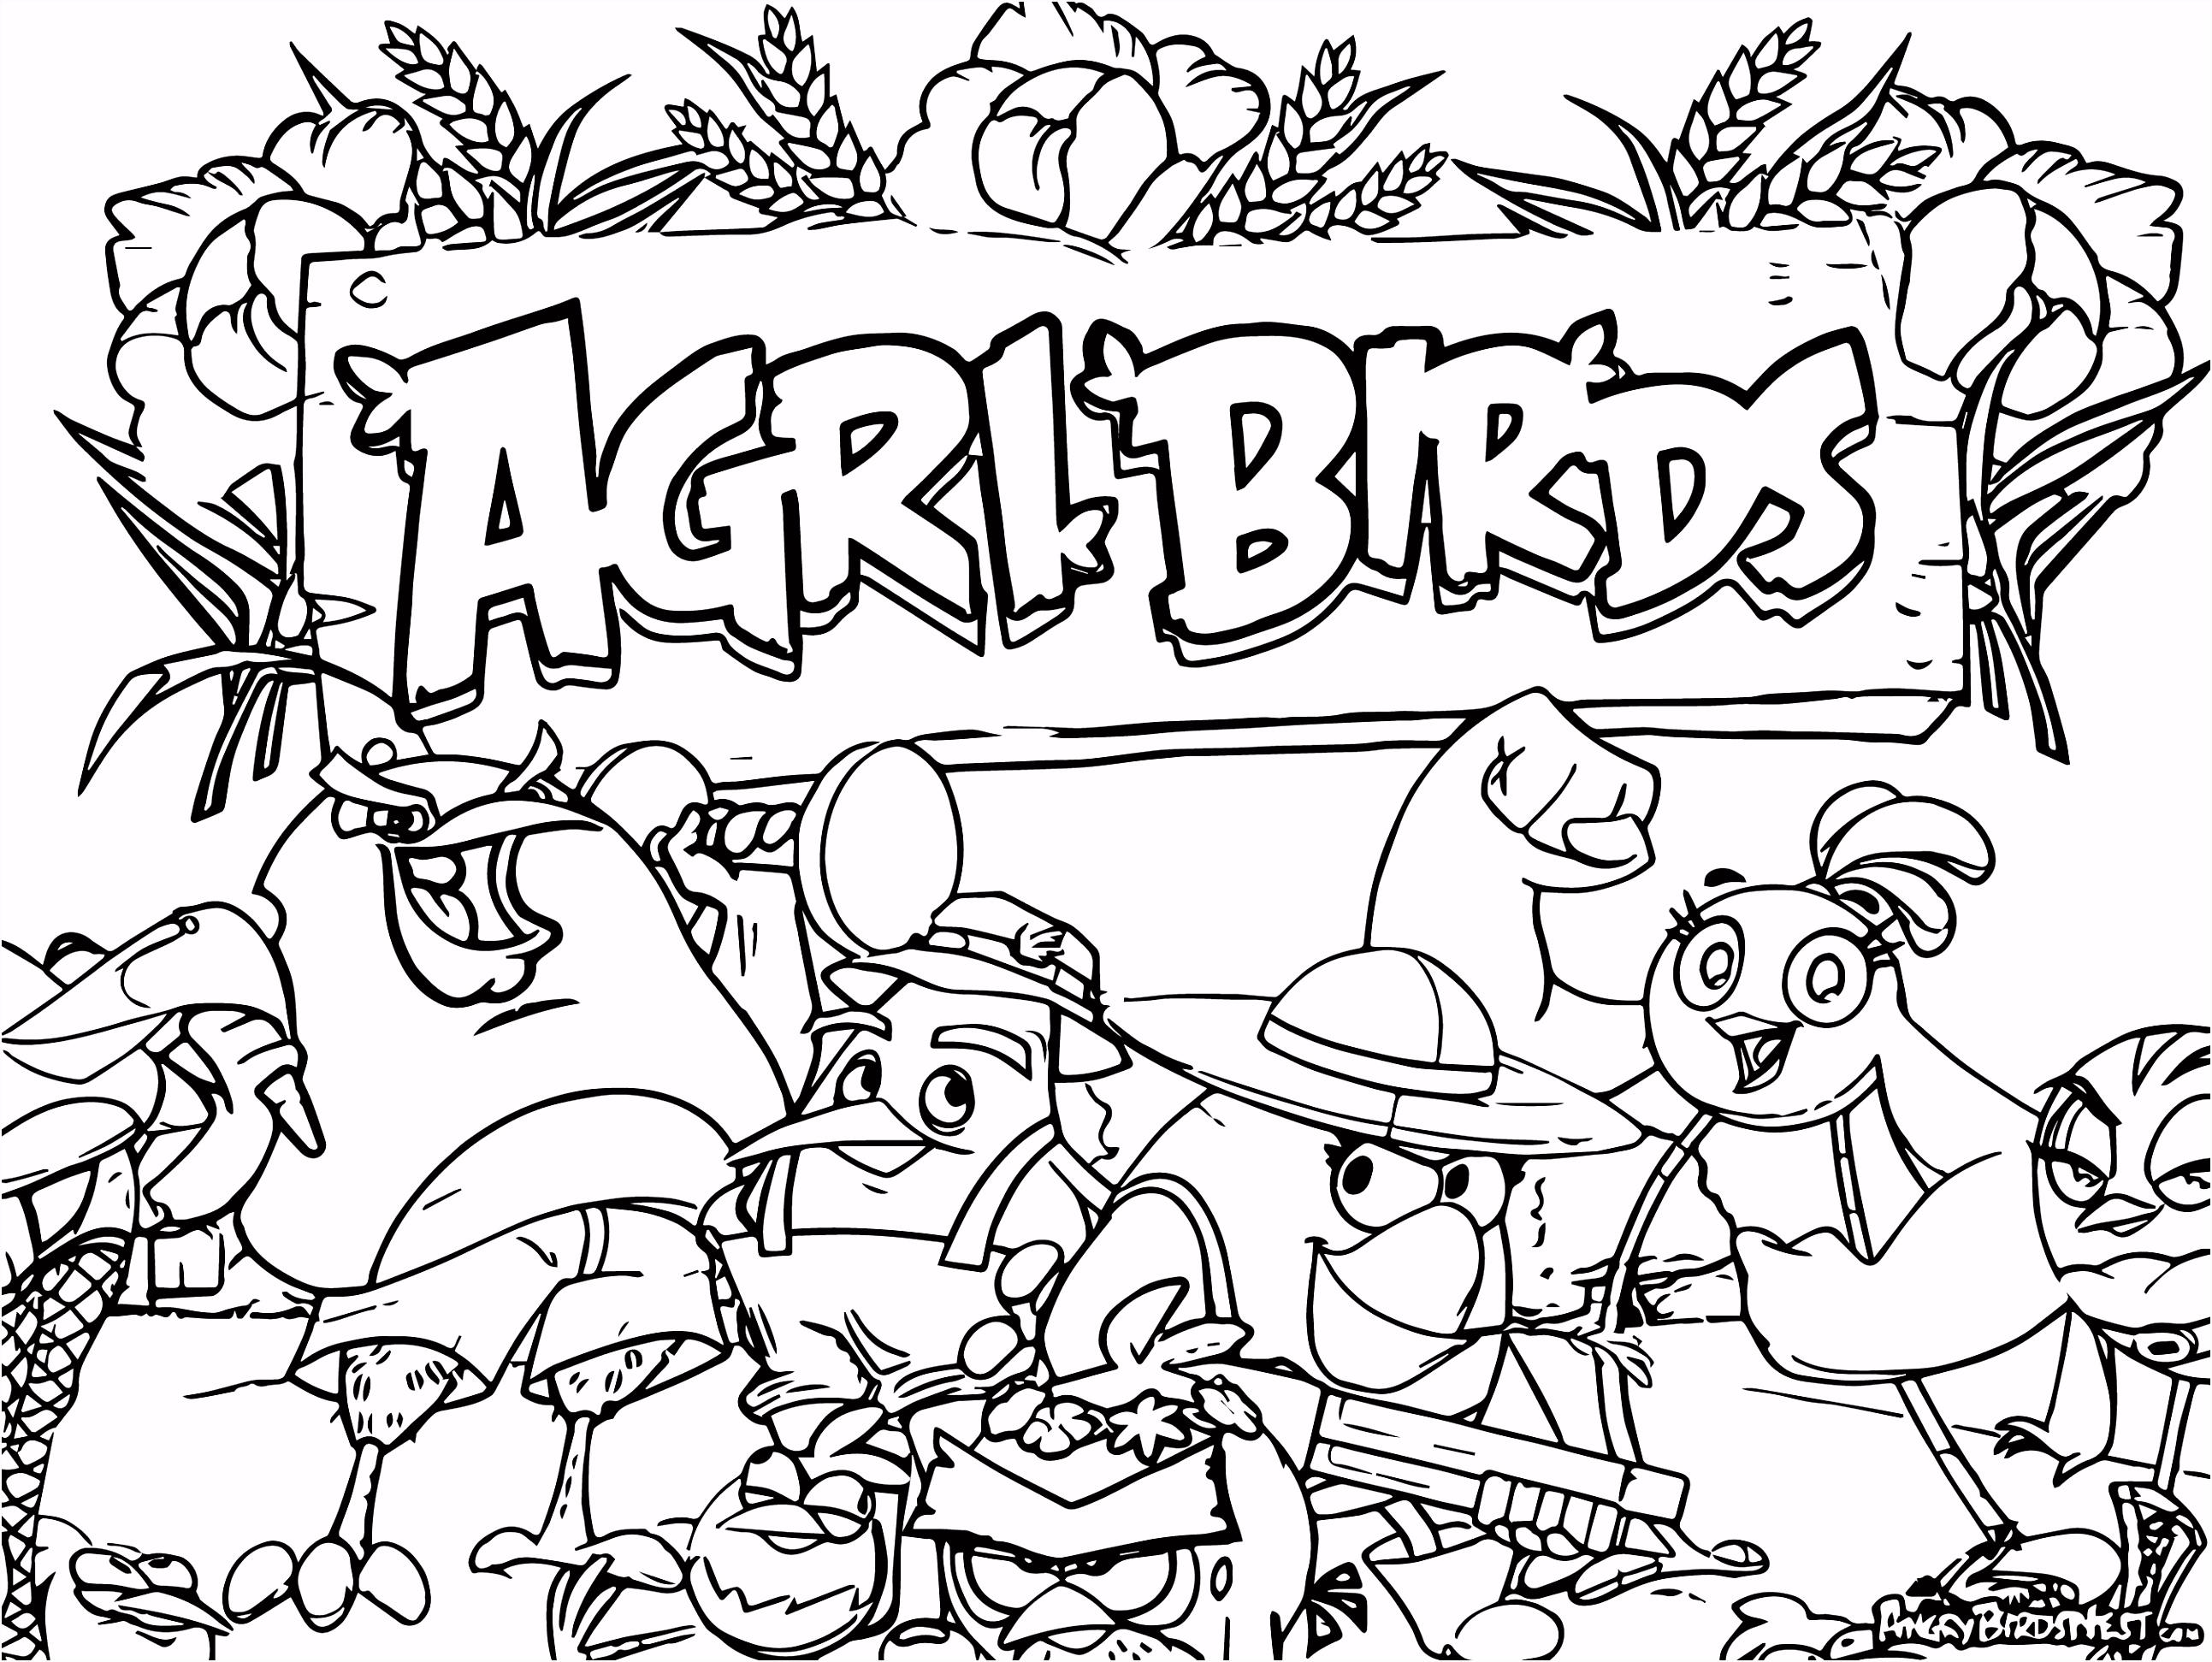 Kleurplaten Angry Birds Space.Angry Bird Space Kleurplaten Polar Express Coloring Book New Cool